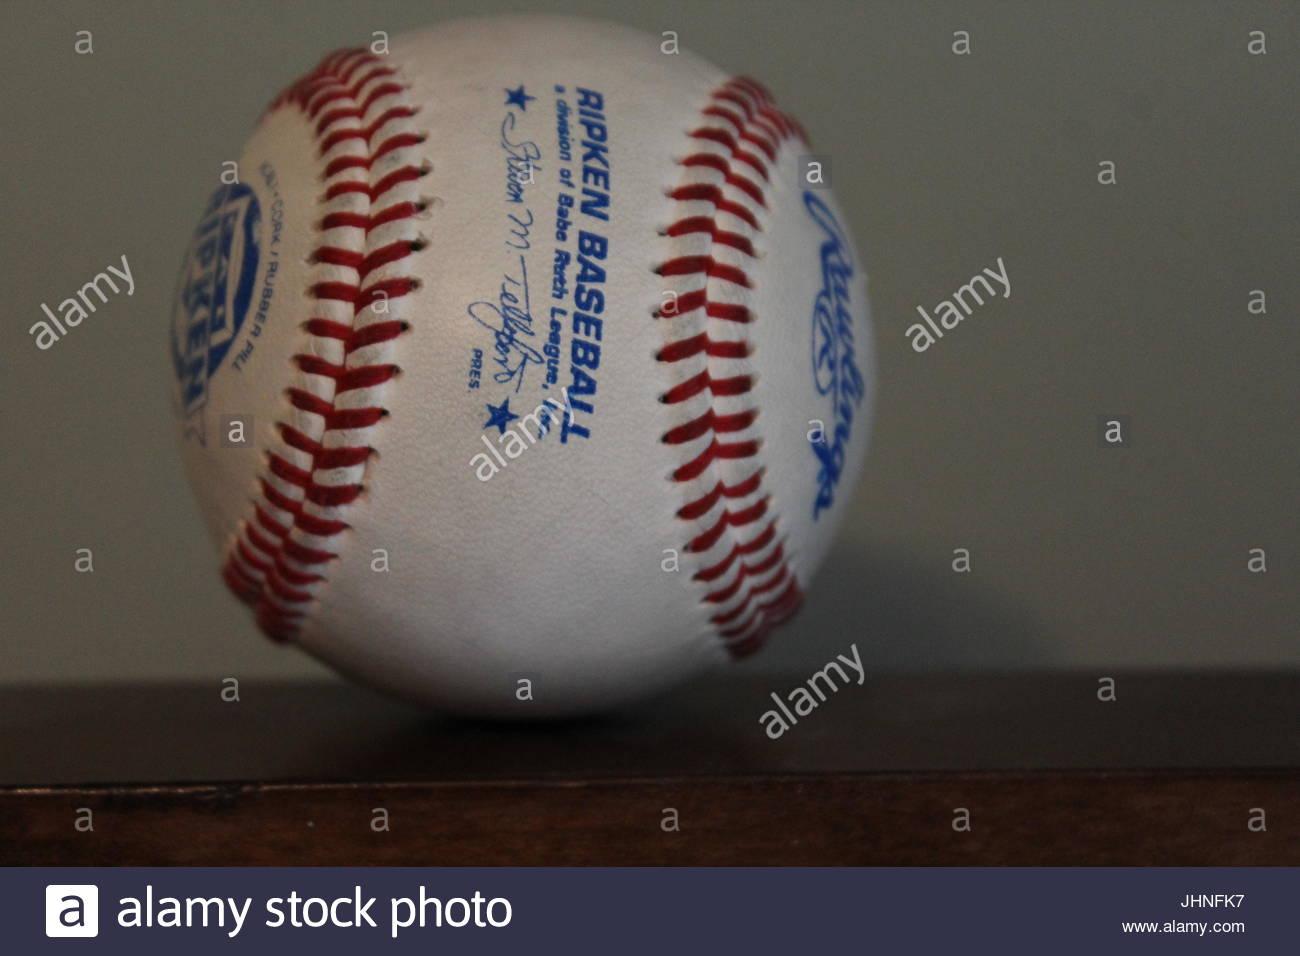 Ripken Youth Baseball - Stock Image